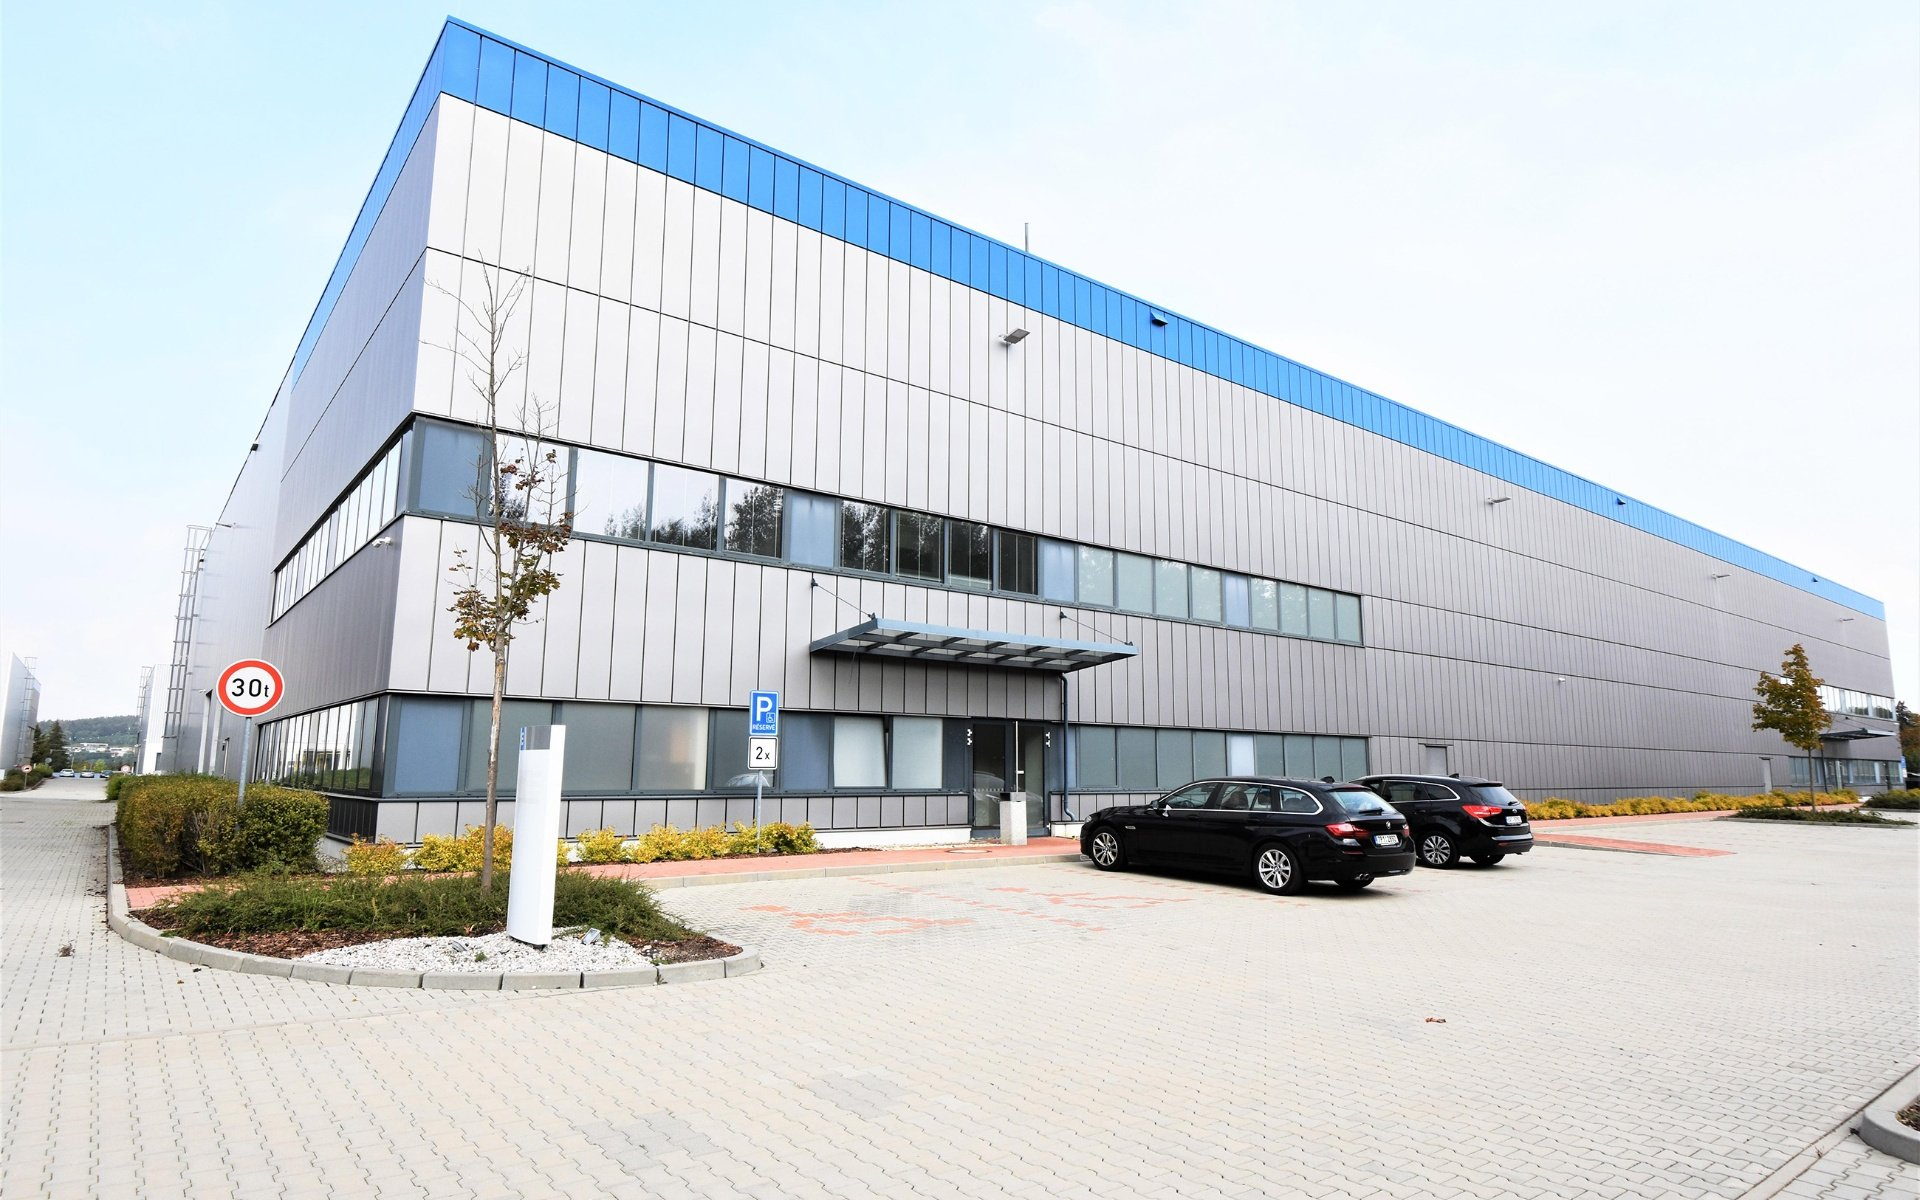 Gewerbegebiet Plzeň - Křimice, Lager zur Miete 5.454 m2